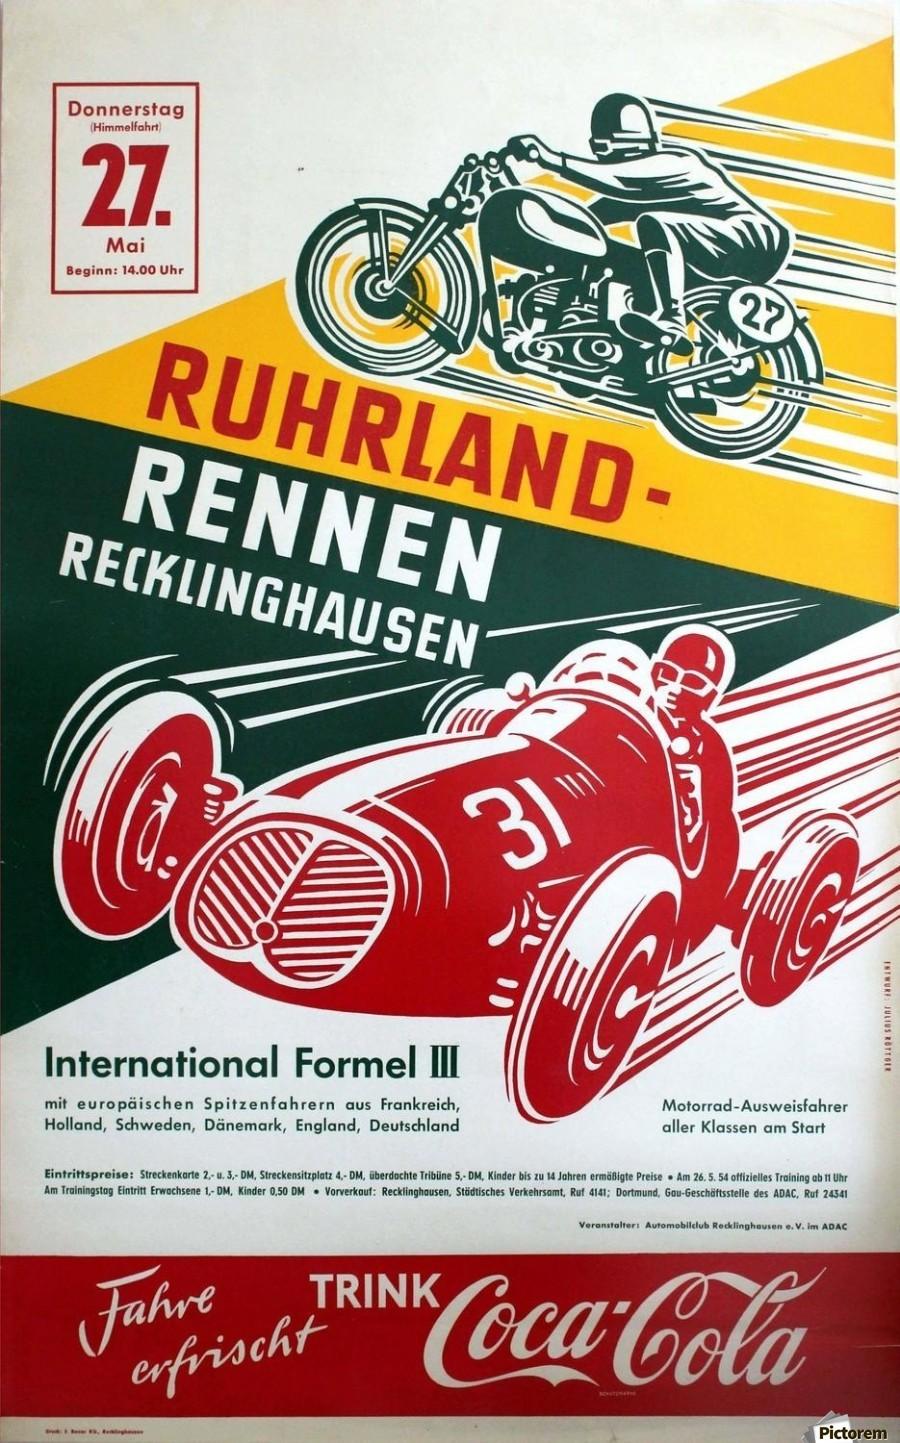 Original Vintage Car and Motorcycle Racing Poster - VINTAGE POSTER ...